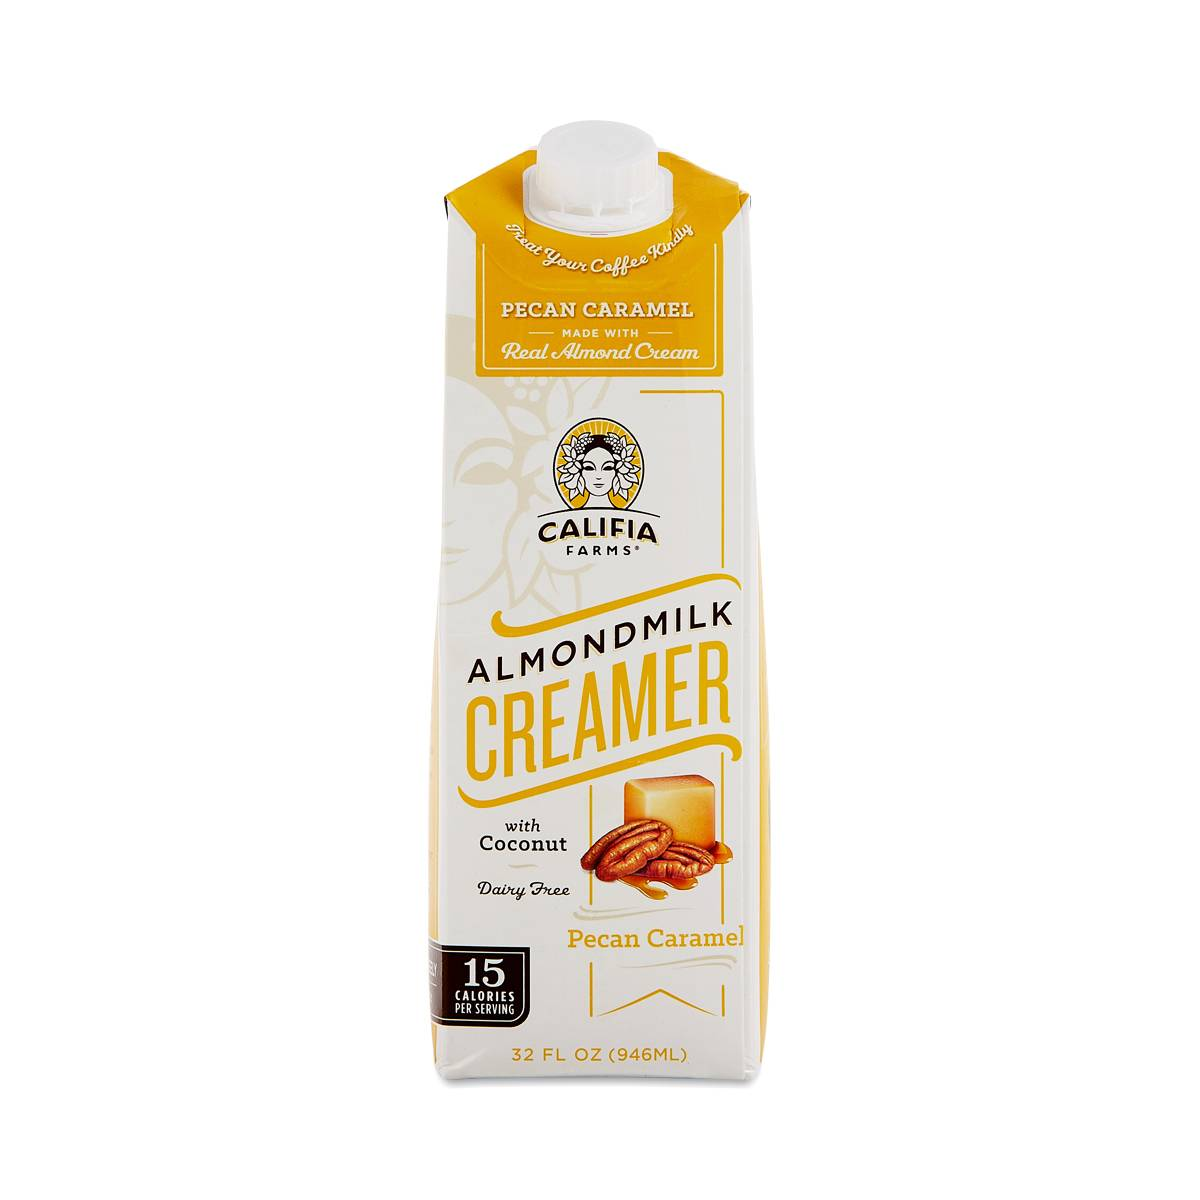 Pecan Amp Caramel Almond Milk Creamer By Califia Farms